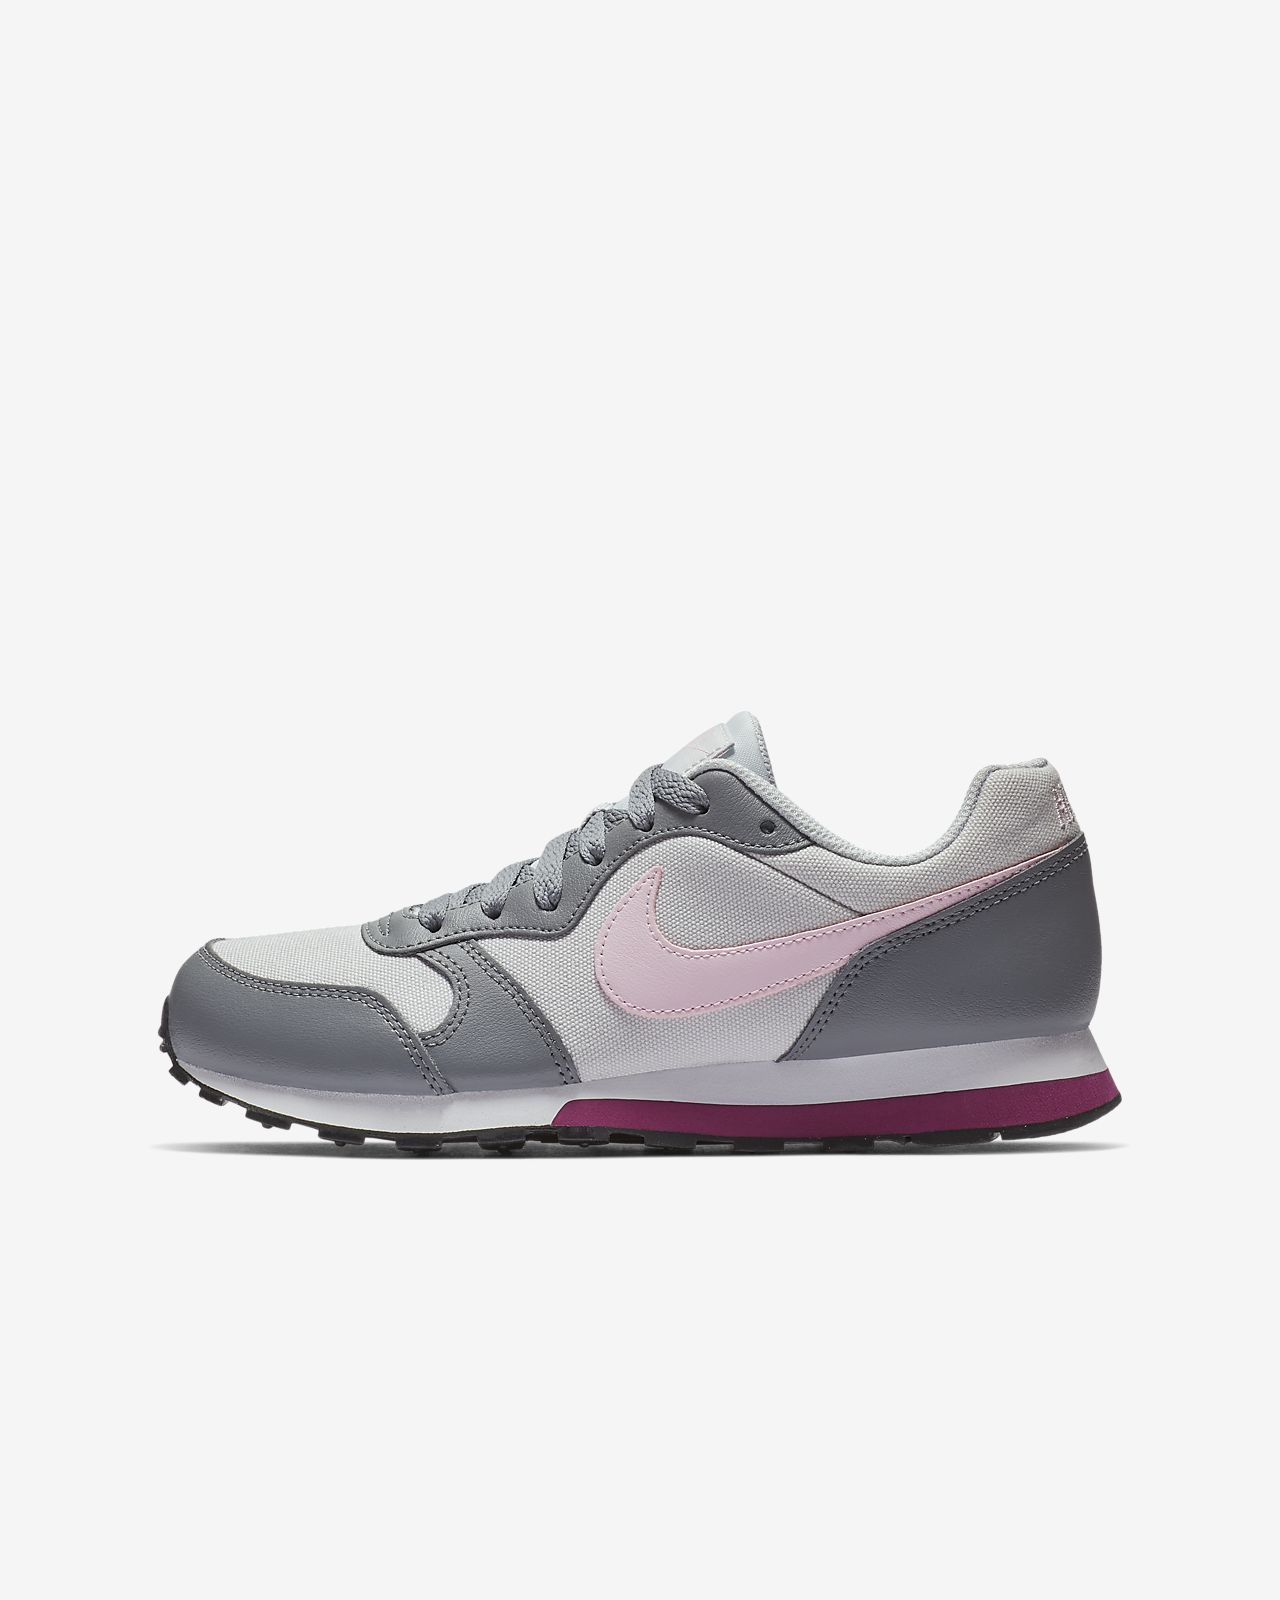 305ad00e598 Nike MD Runner 2 Older Kids  Shoe. Nike.com GB